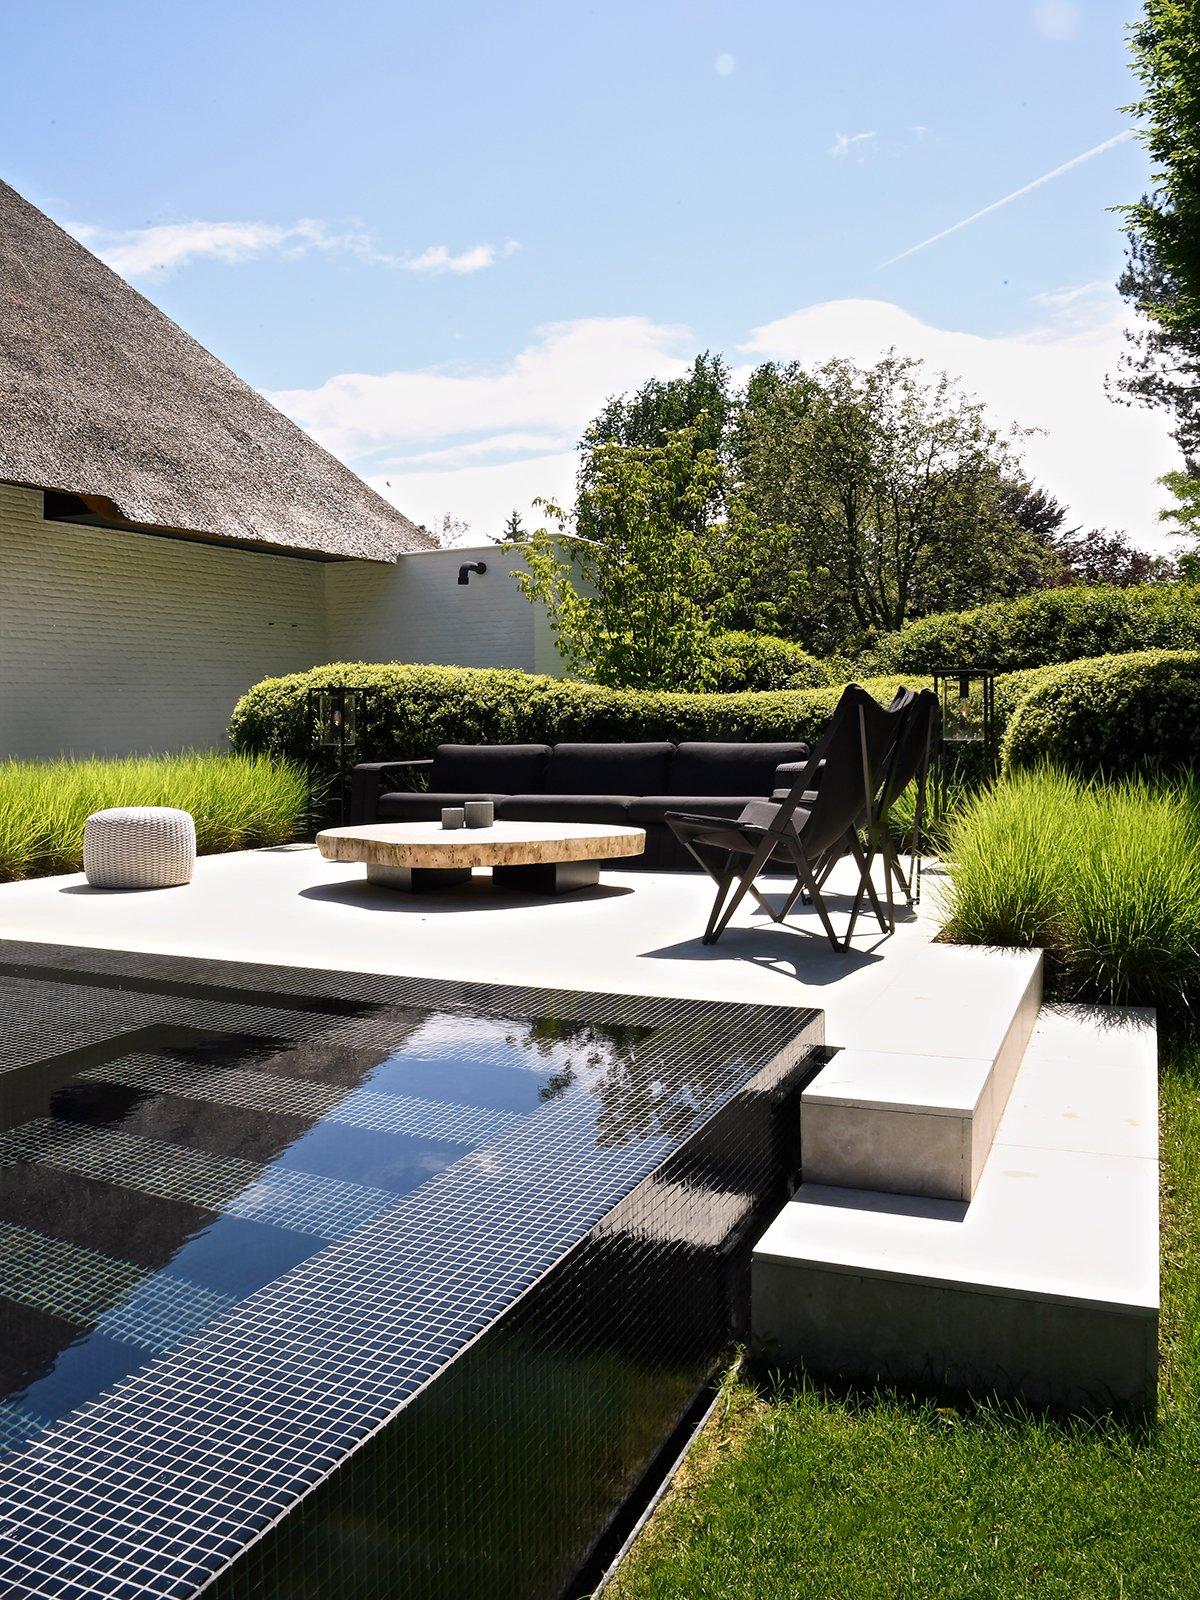 Verrassend modern landelijk, Sels Villabouw, modern landelijk, the art of living